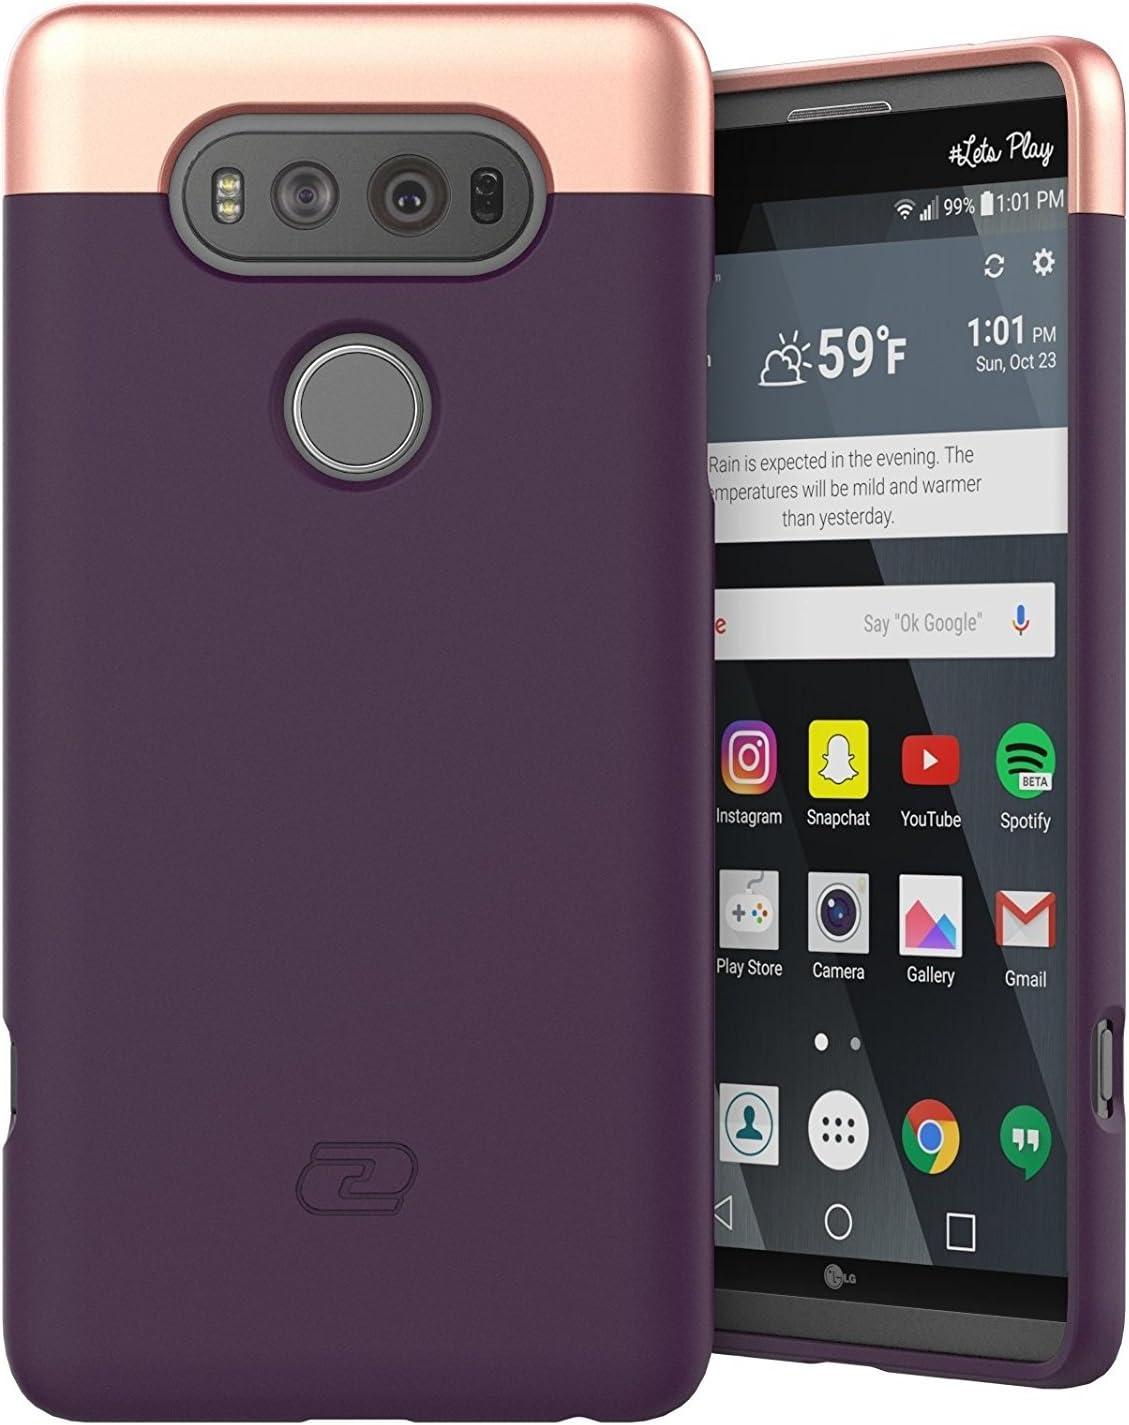 LG V20 Case Purple - Encased Ultra Thin (2016 SlimShield Edition) Full Coverage, Hybrid Tough Shell